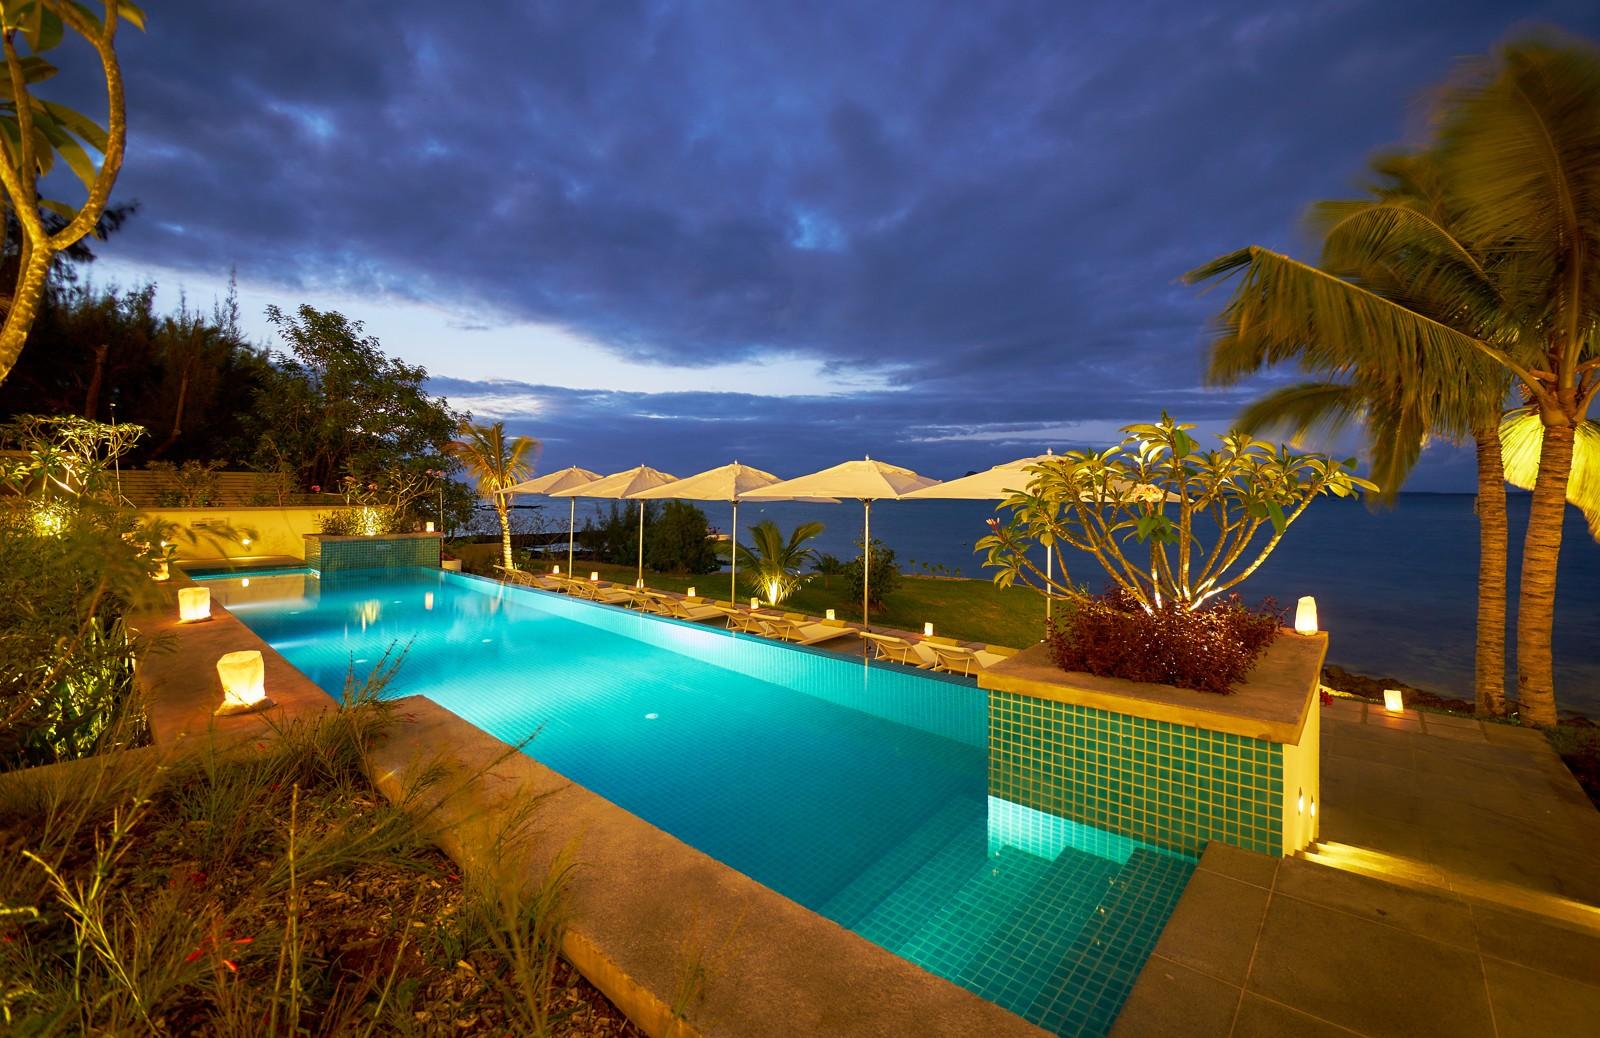 Myra-Property-Mauritius-Immobilier-1.jpg